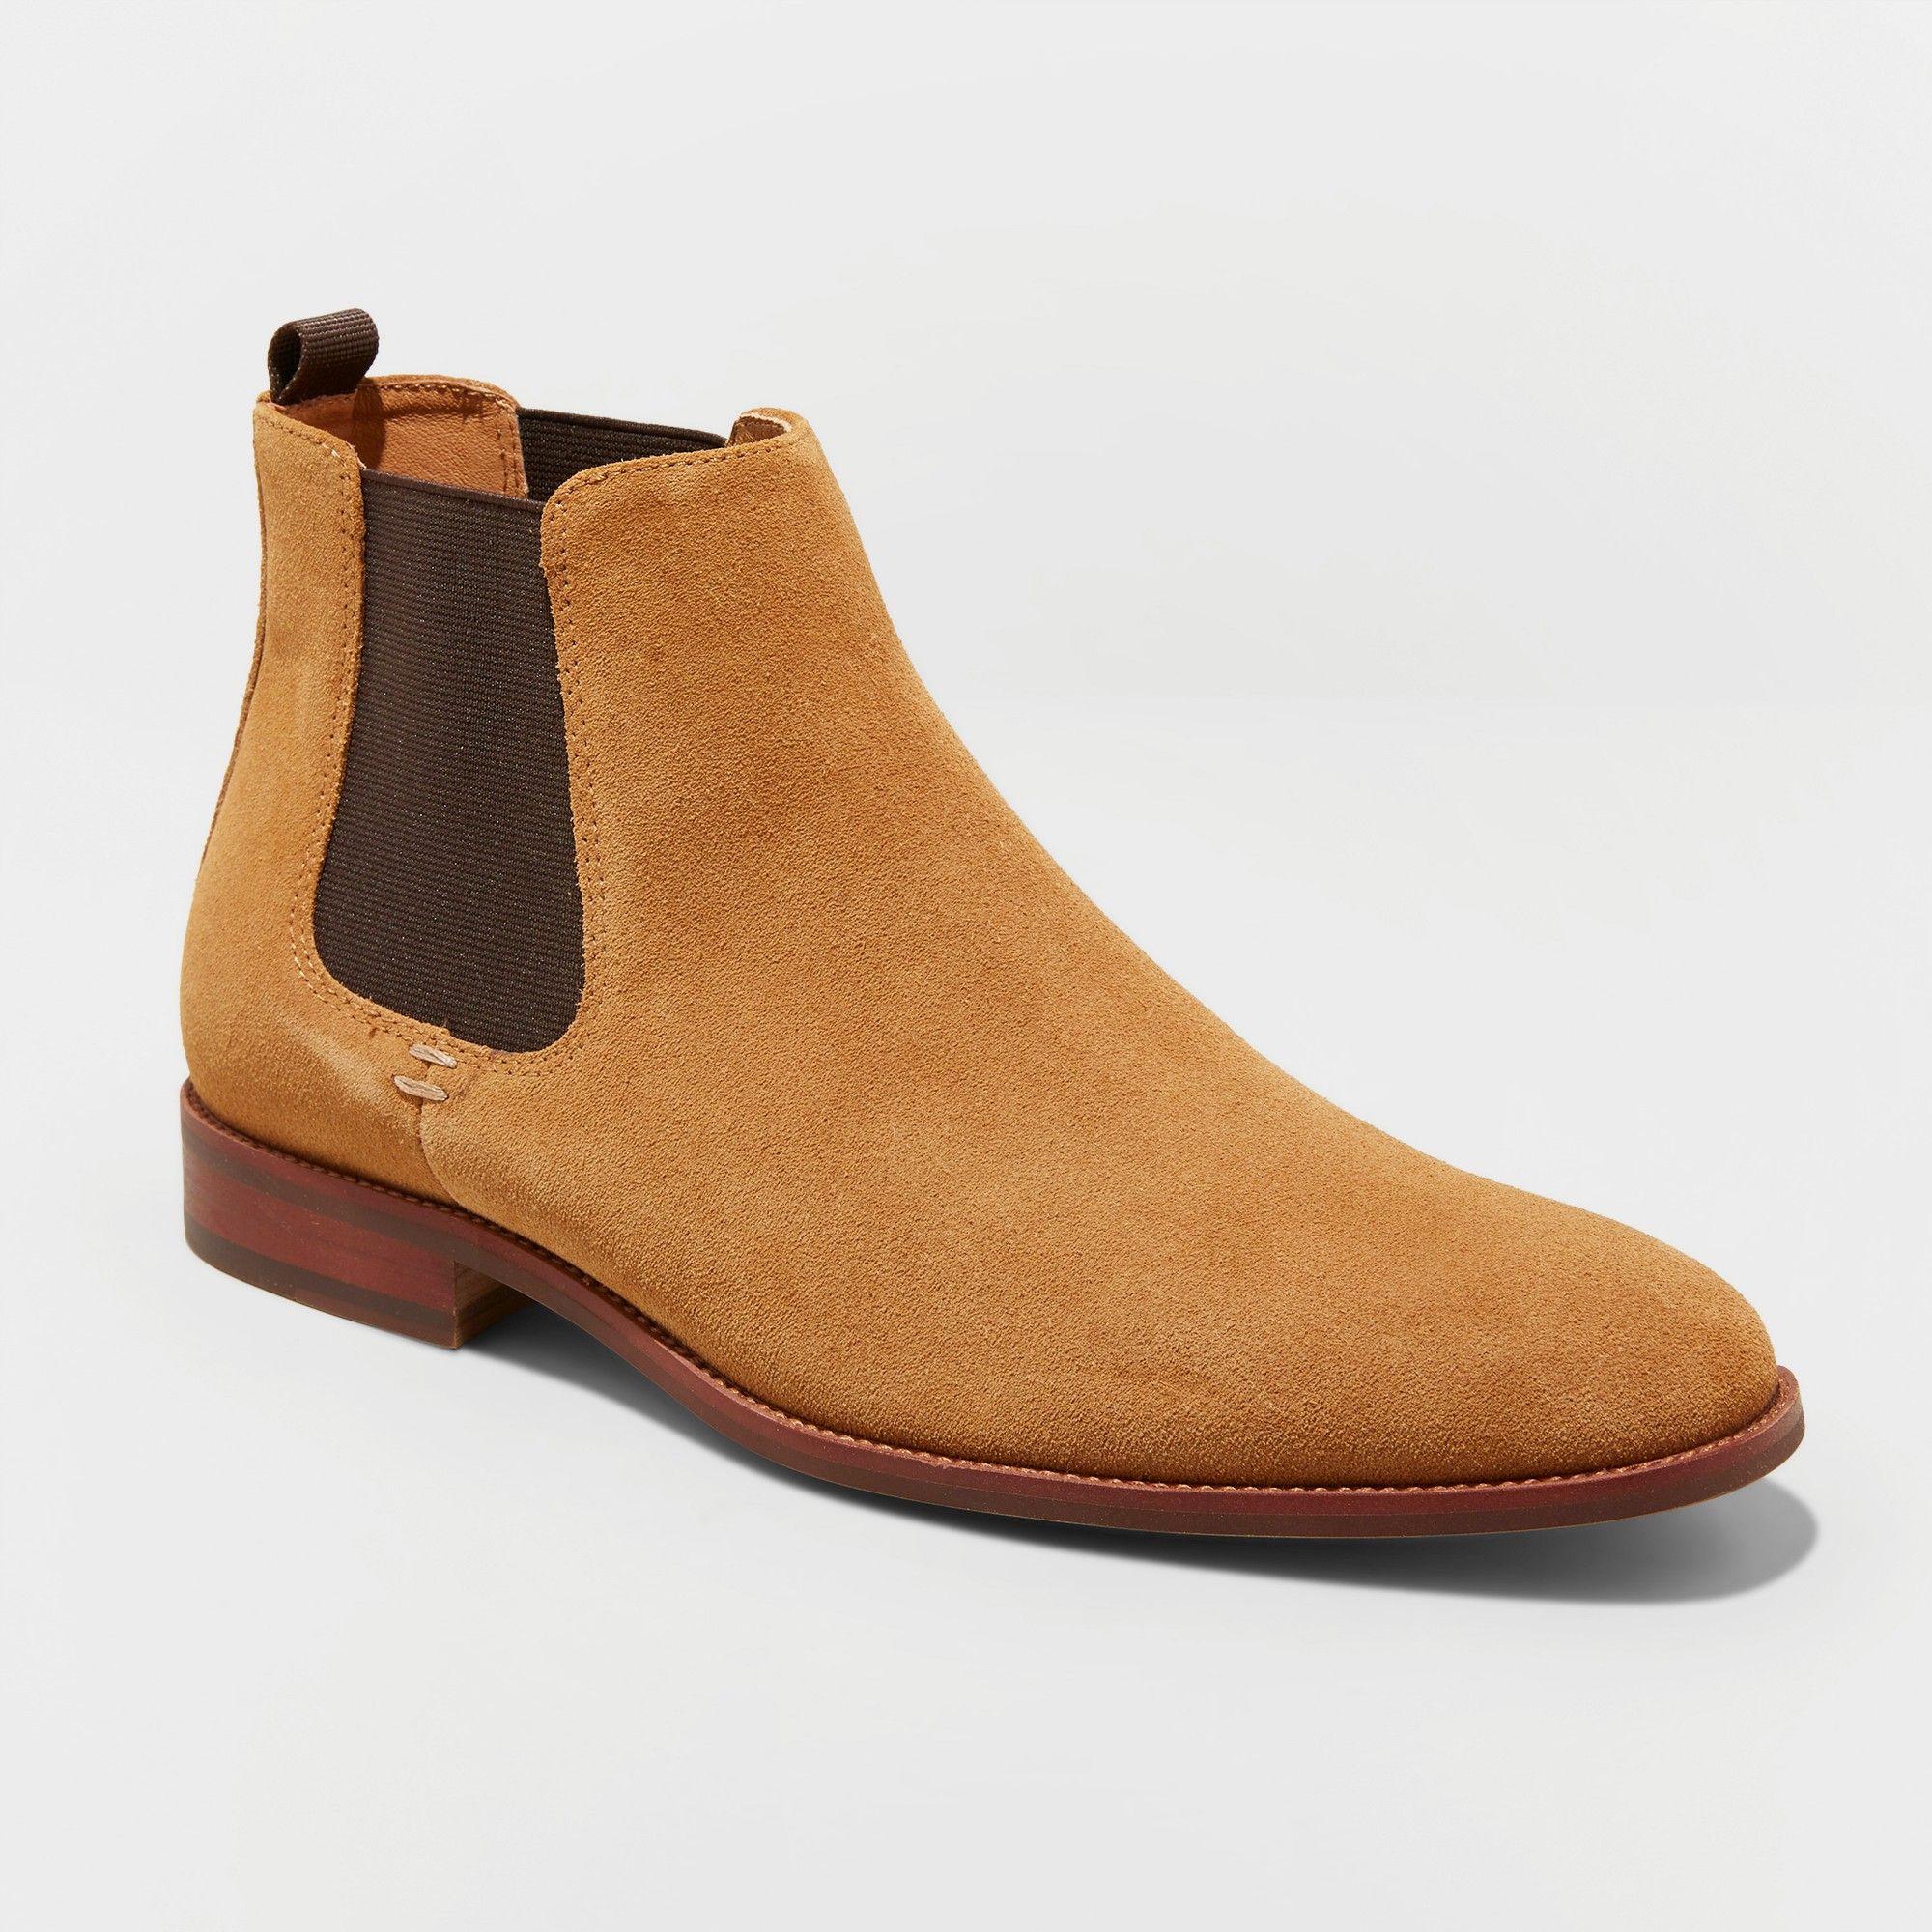 Mens shoes Tofa: customer reviews